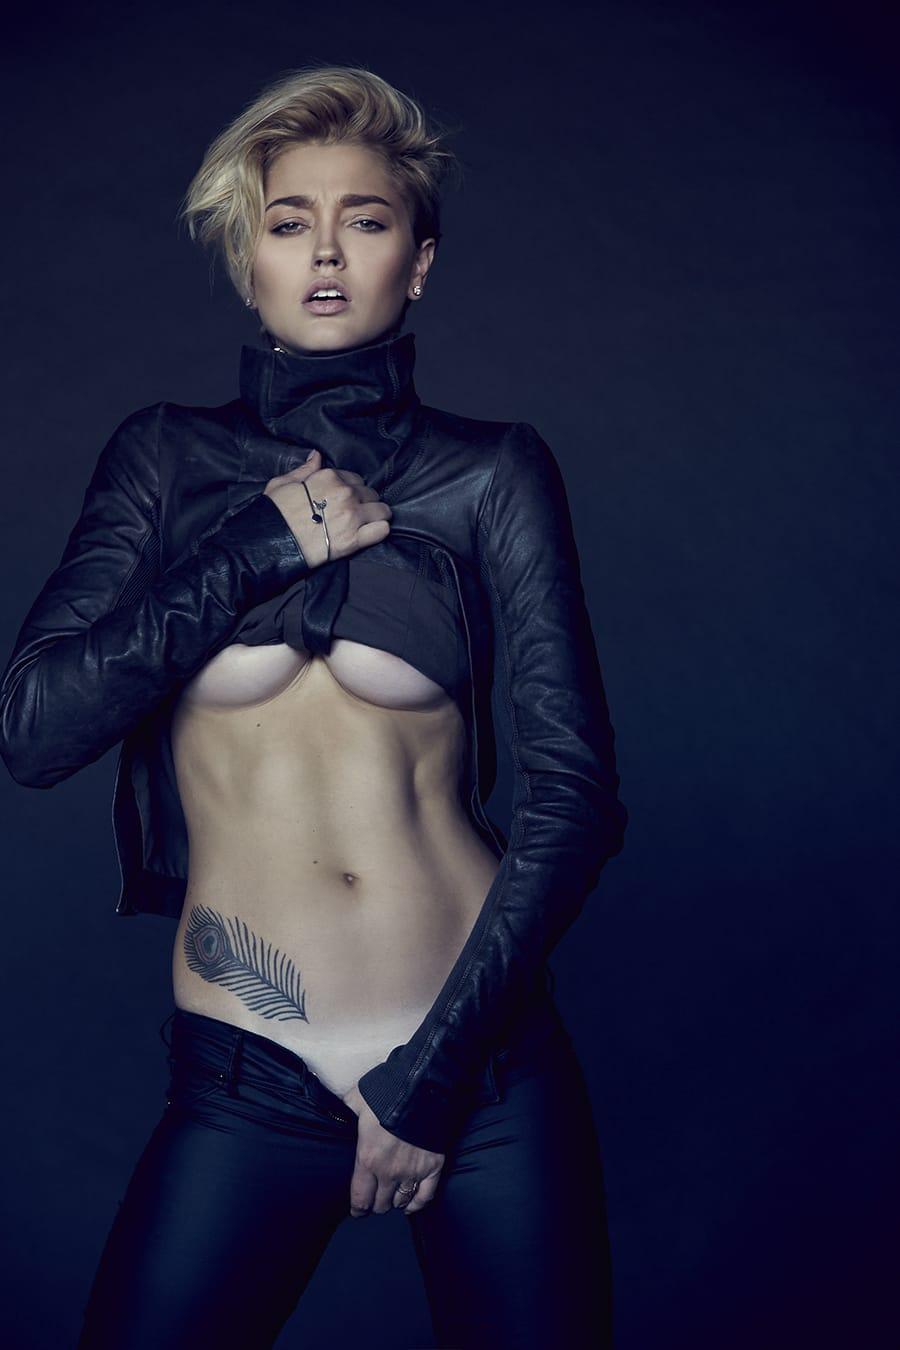 Hot Heather Depriest  nudes (44 fotos), Twitter, see through